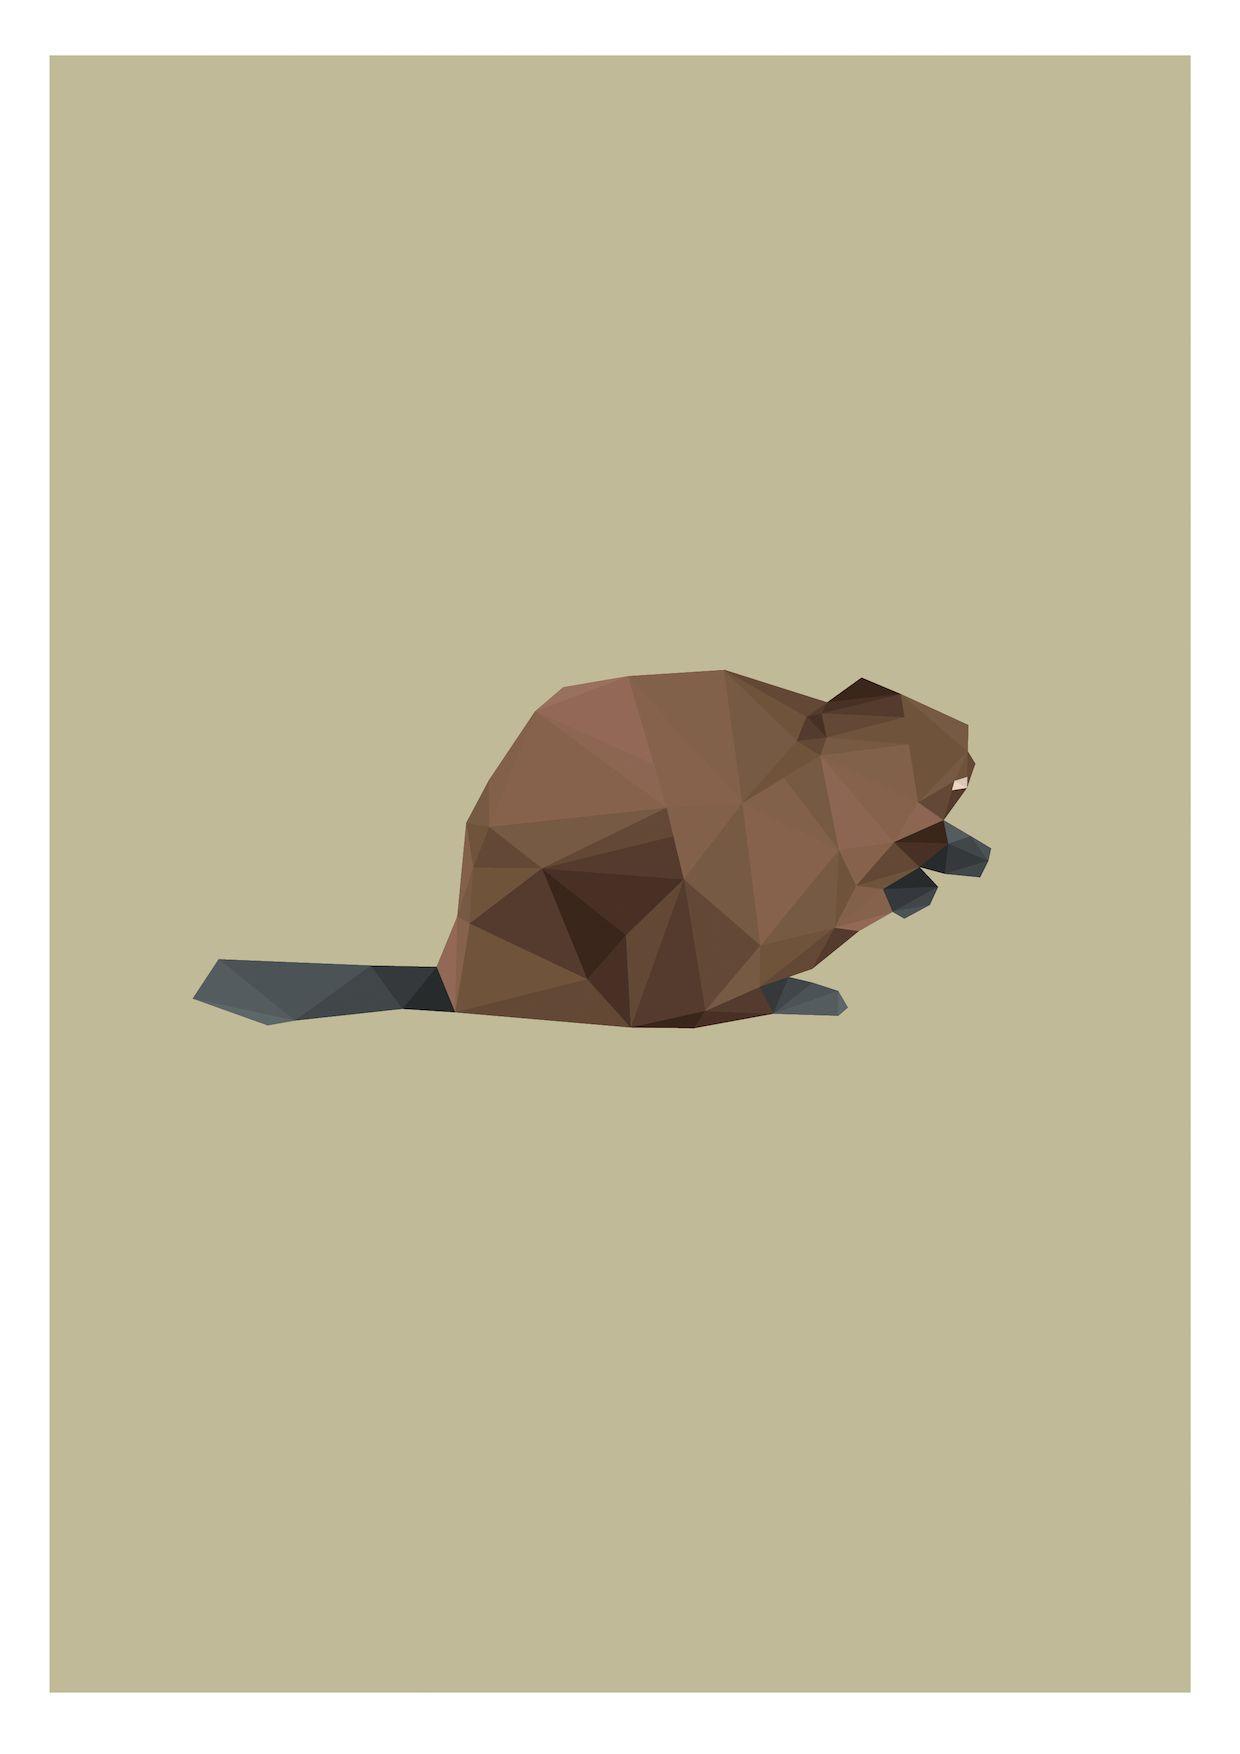 canadian beaver illustration software and digital logos